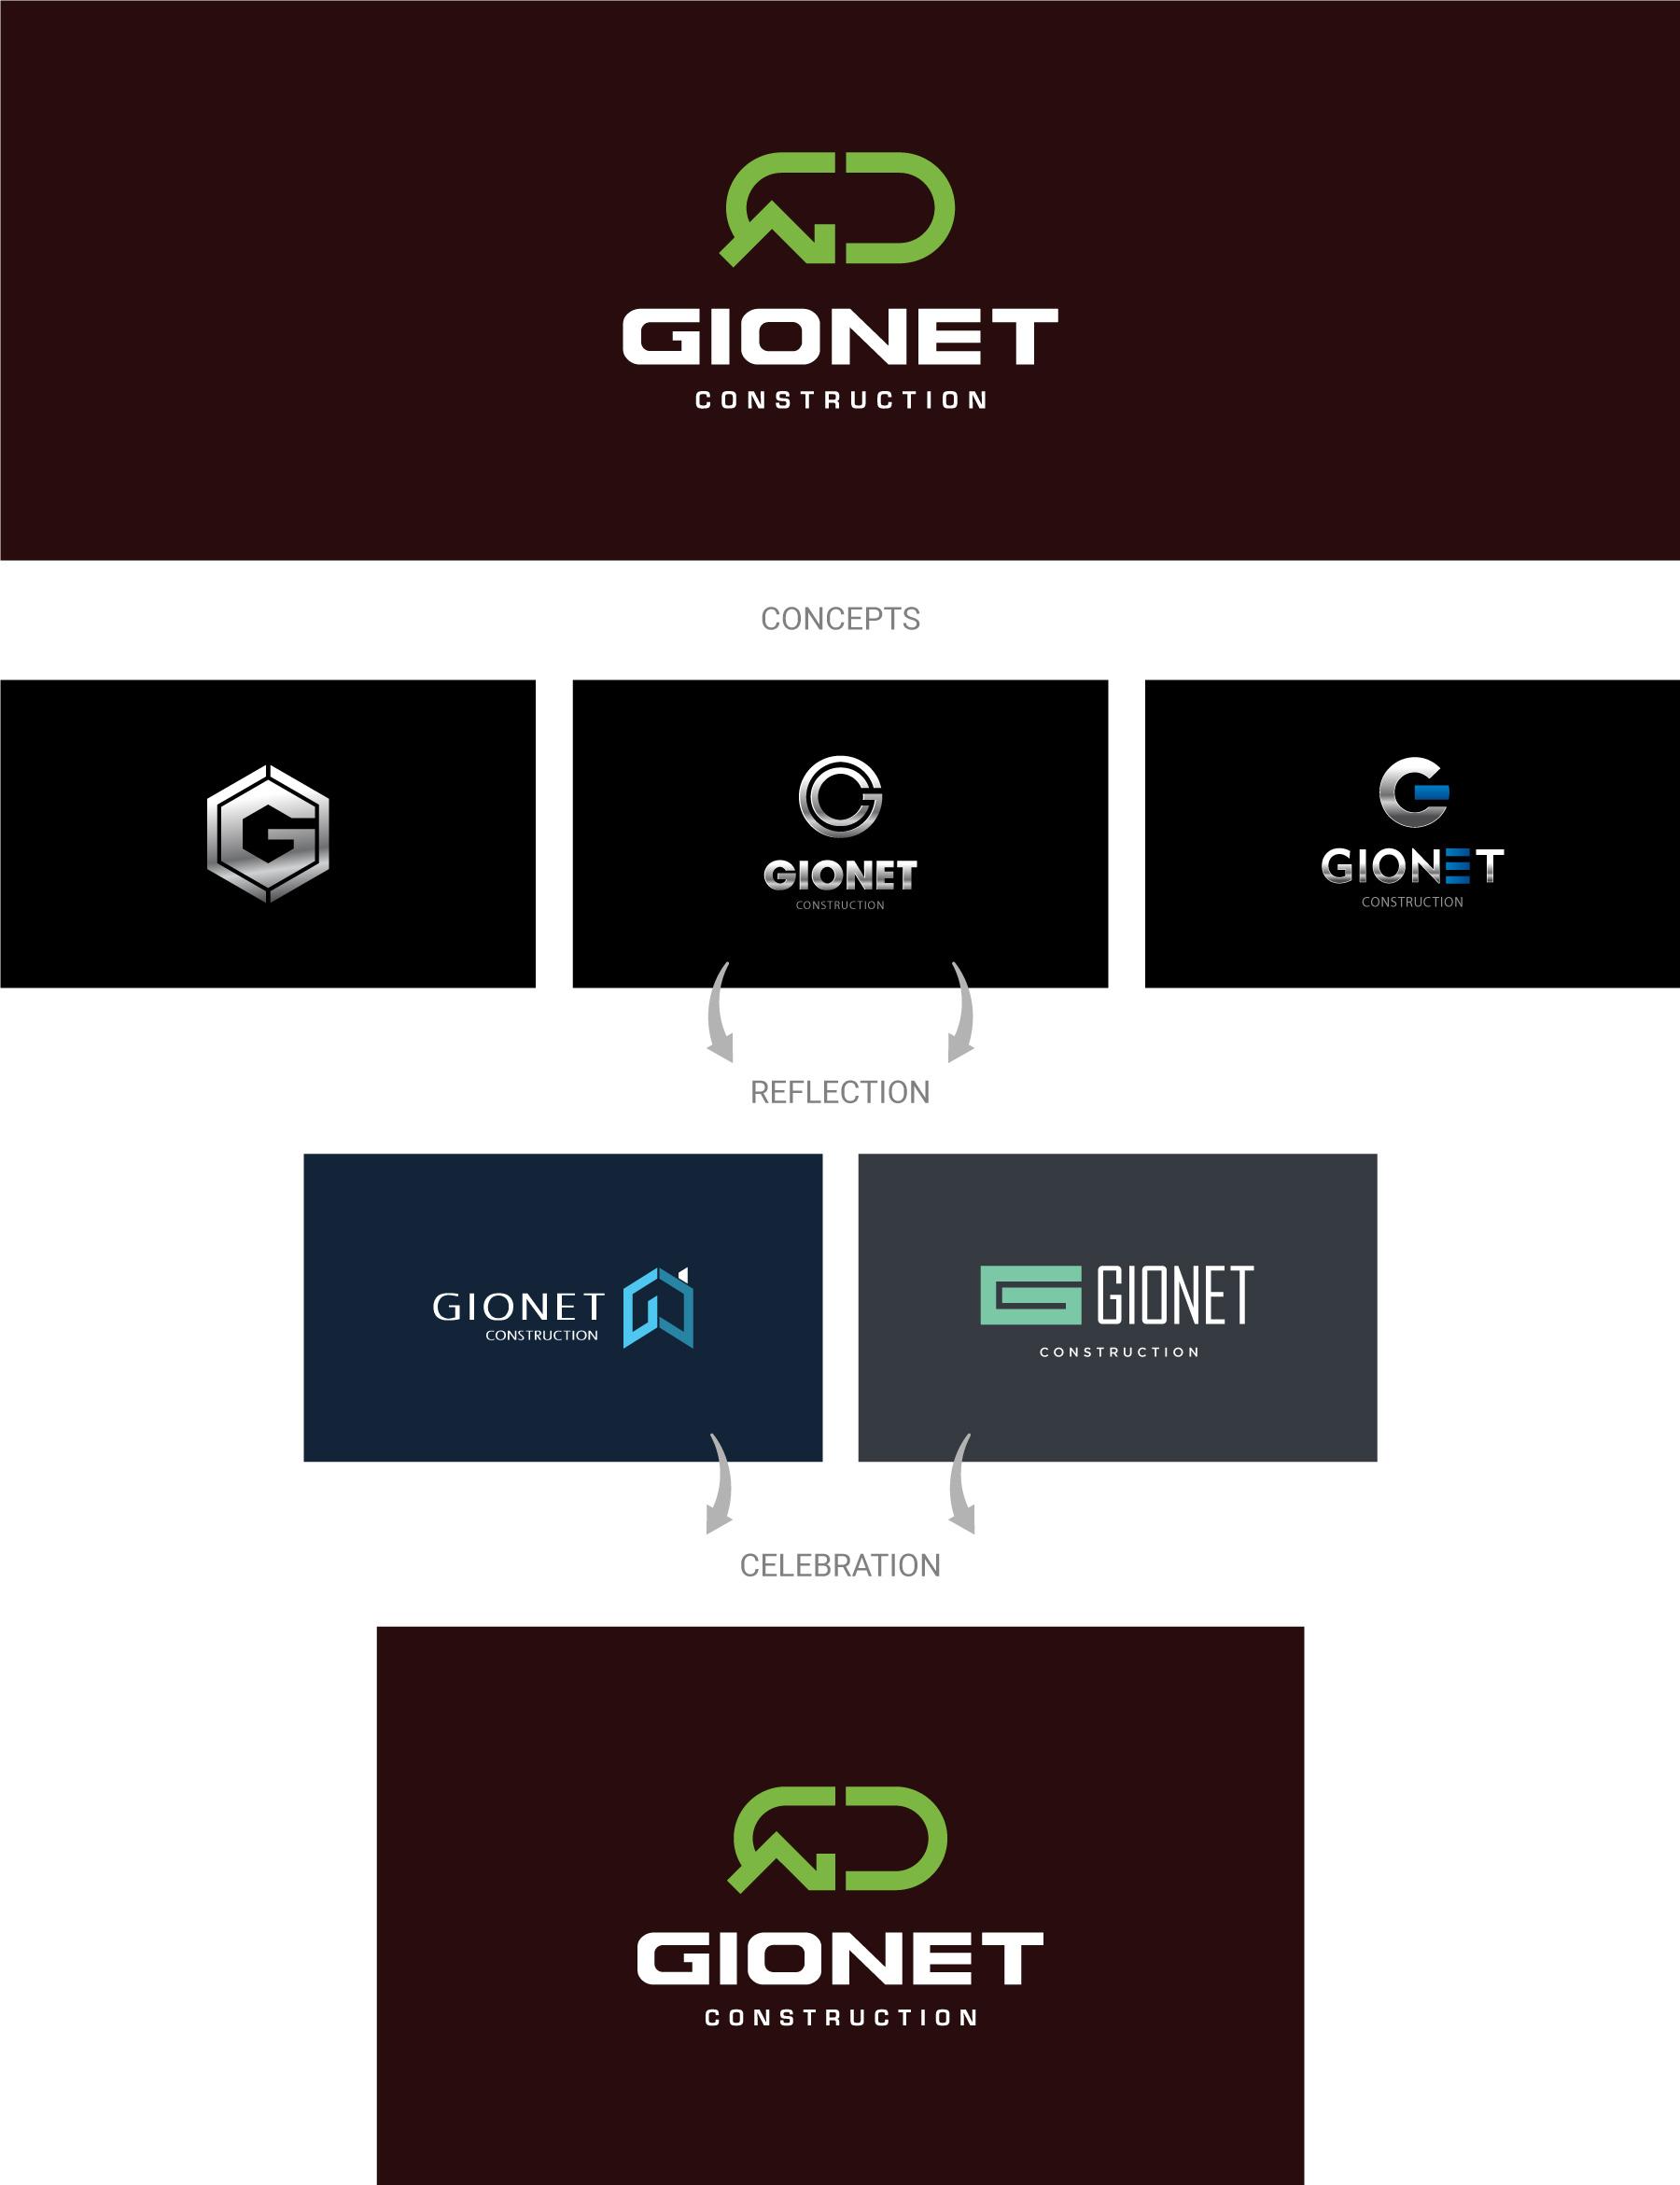 Gionet-construction-logo-design